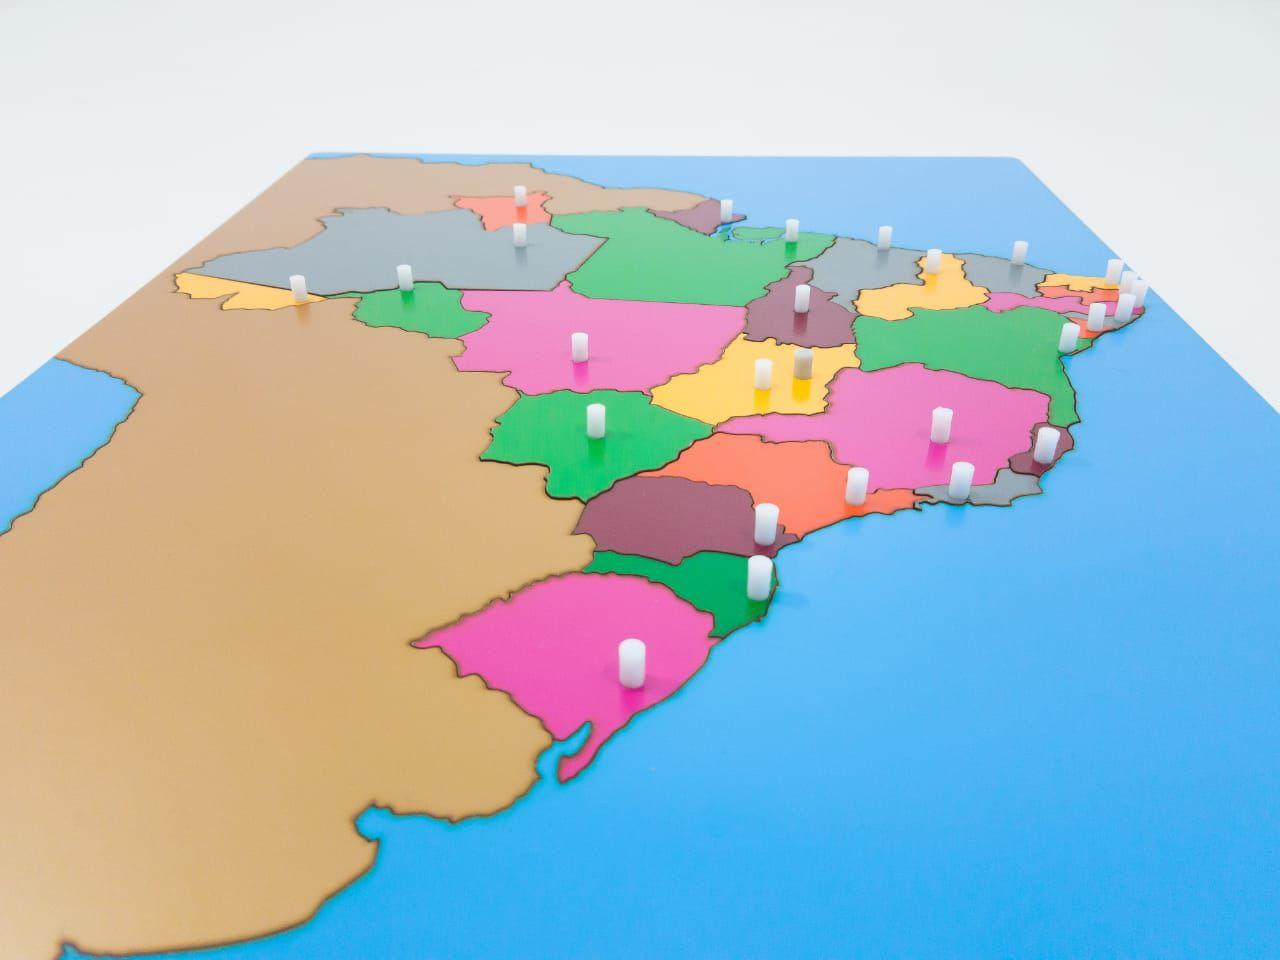 Mapa dos Estados do Brasil